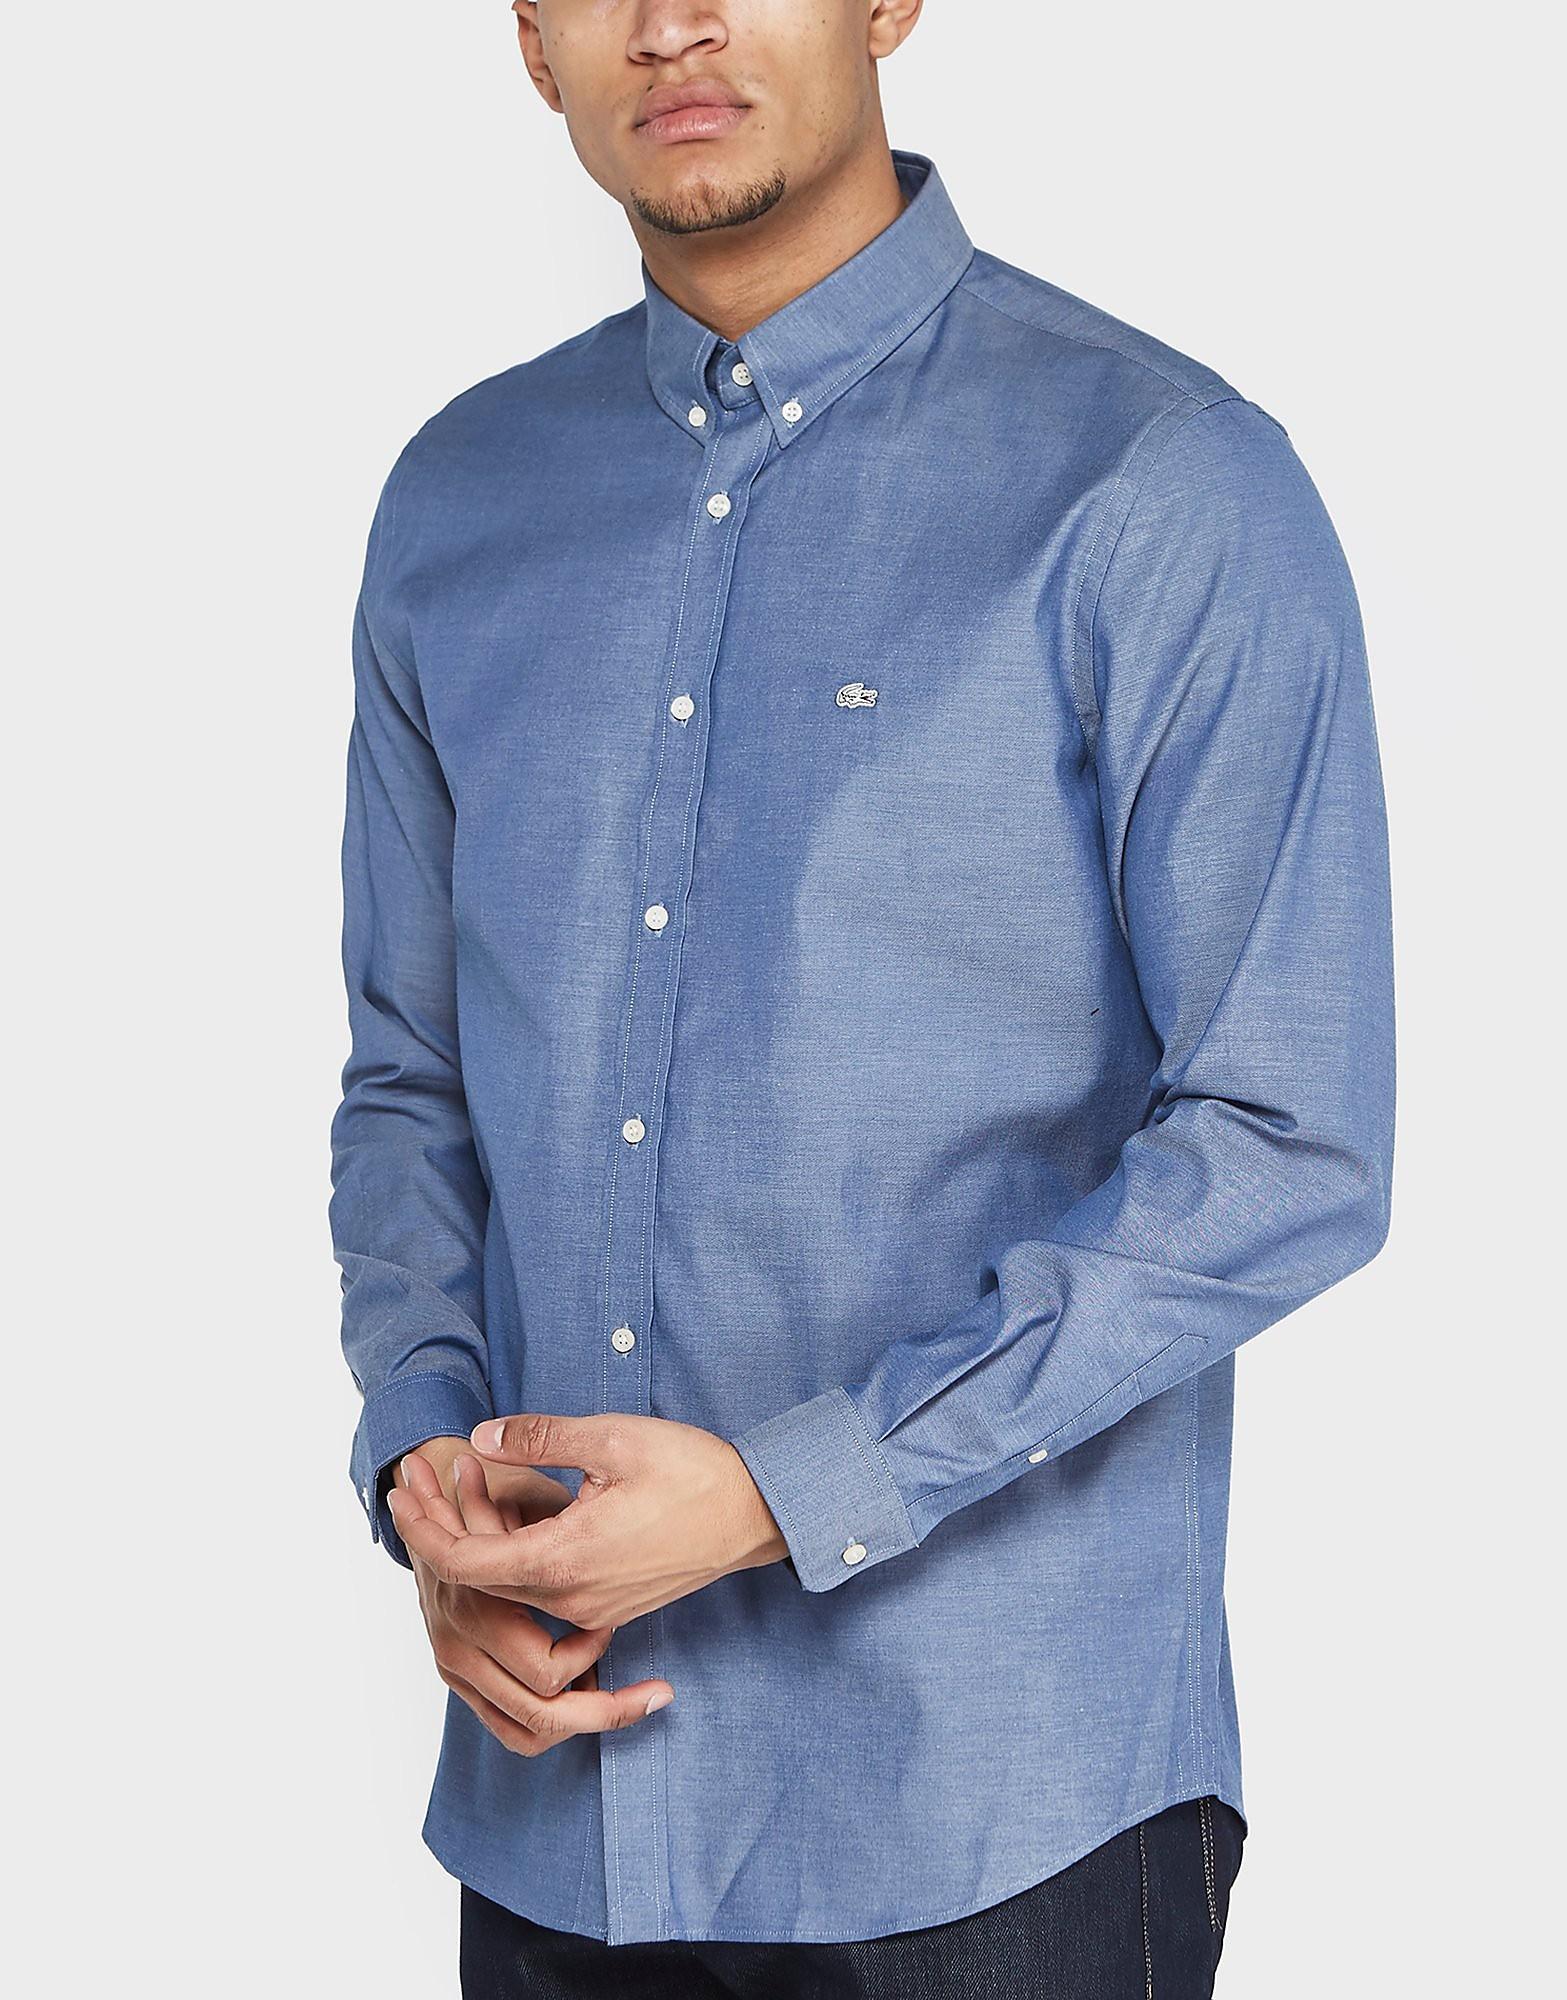 Lacoste City Chambray Shirt